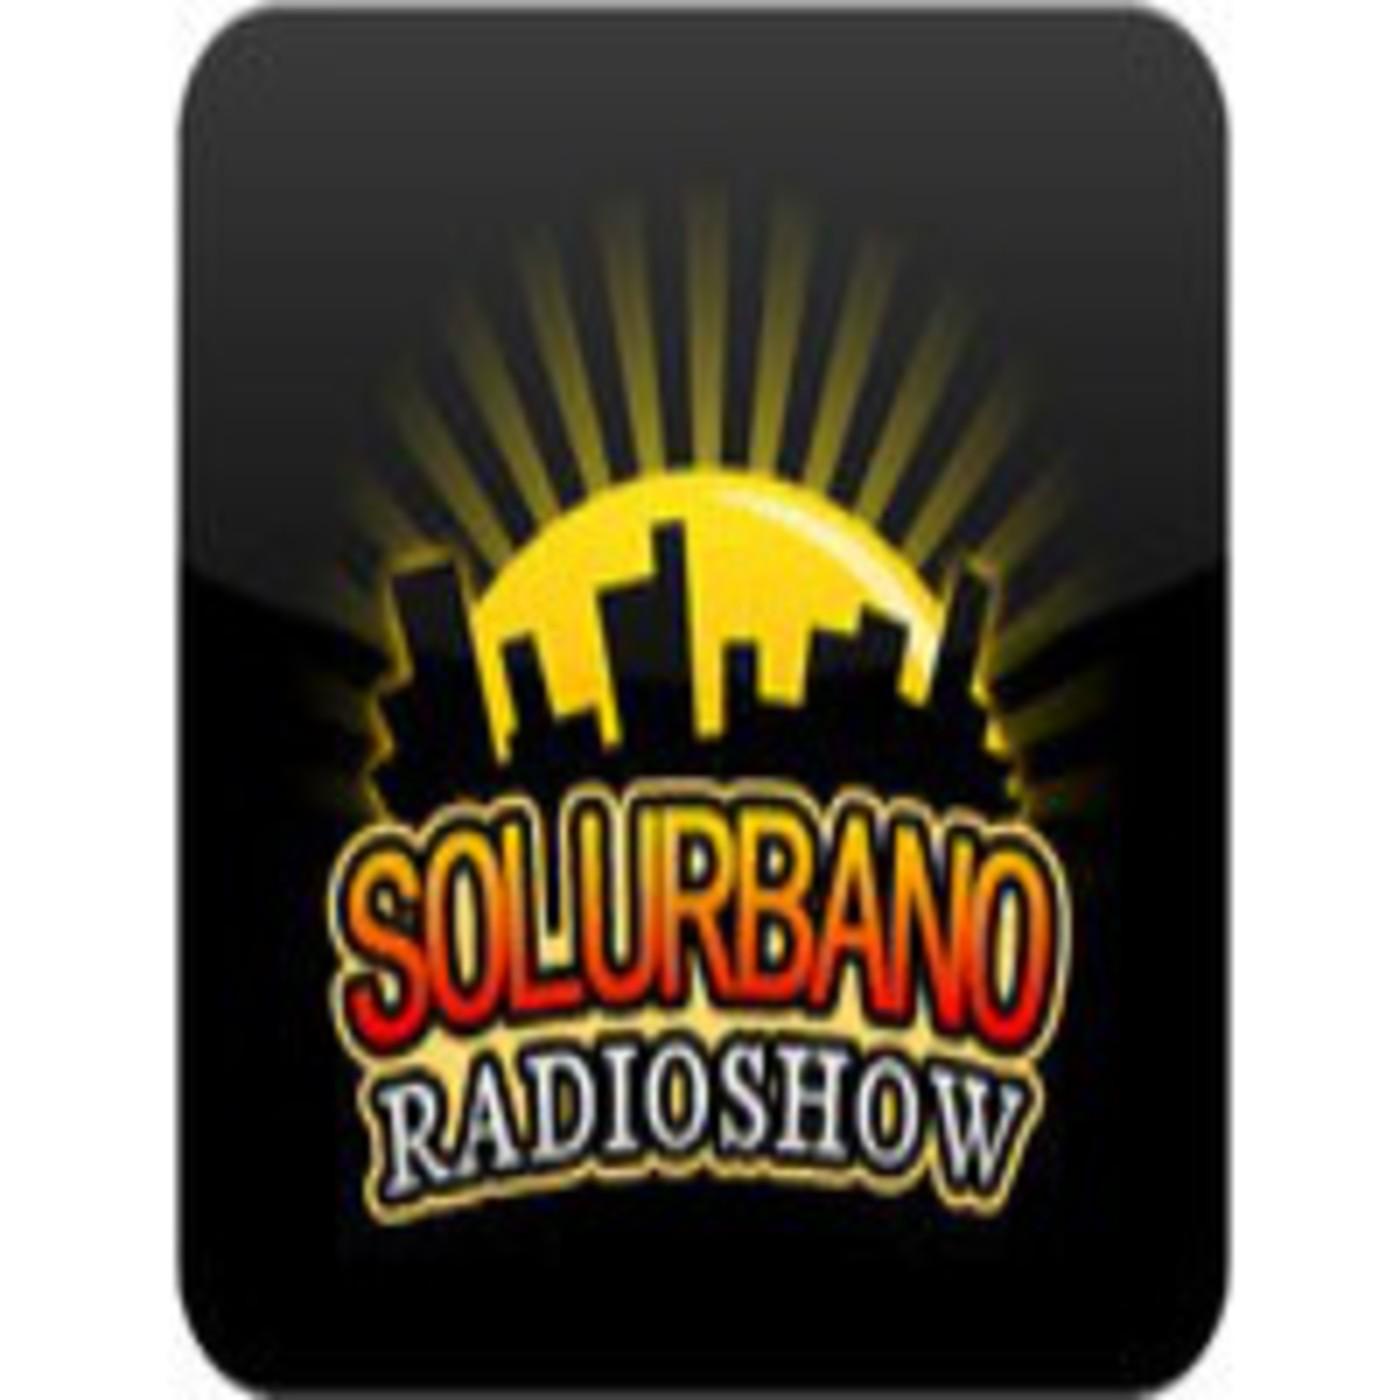 Sol Urbano Radio Show - Programa 28 (Mayo 2011)